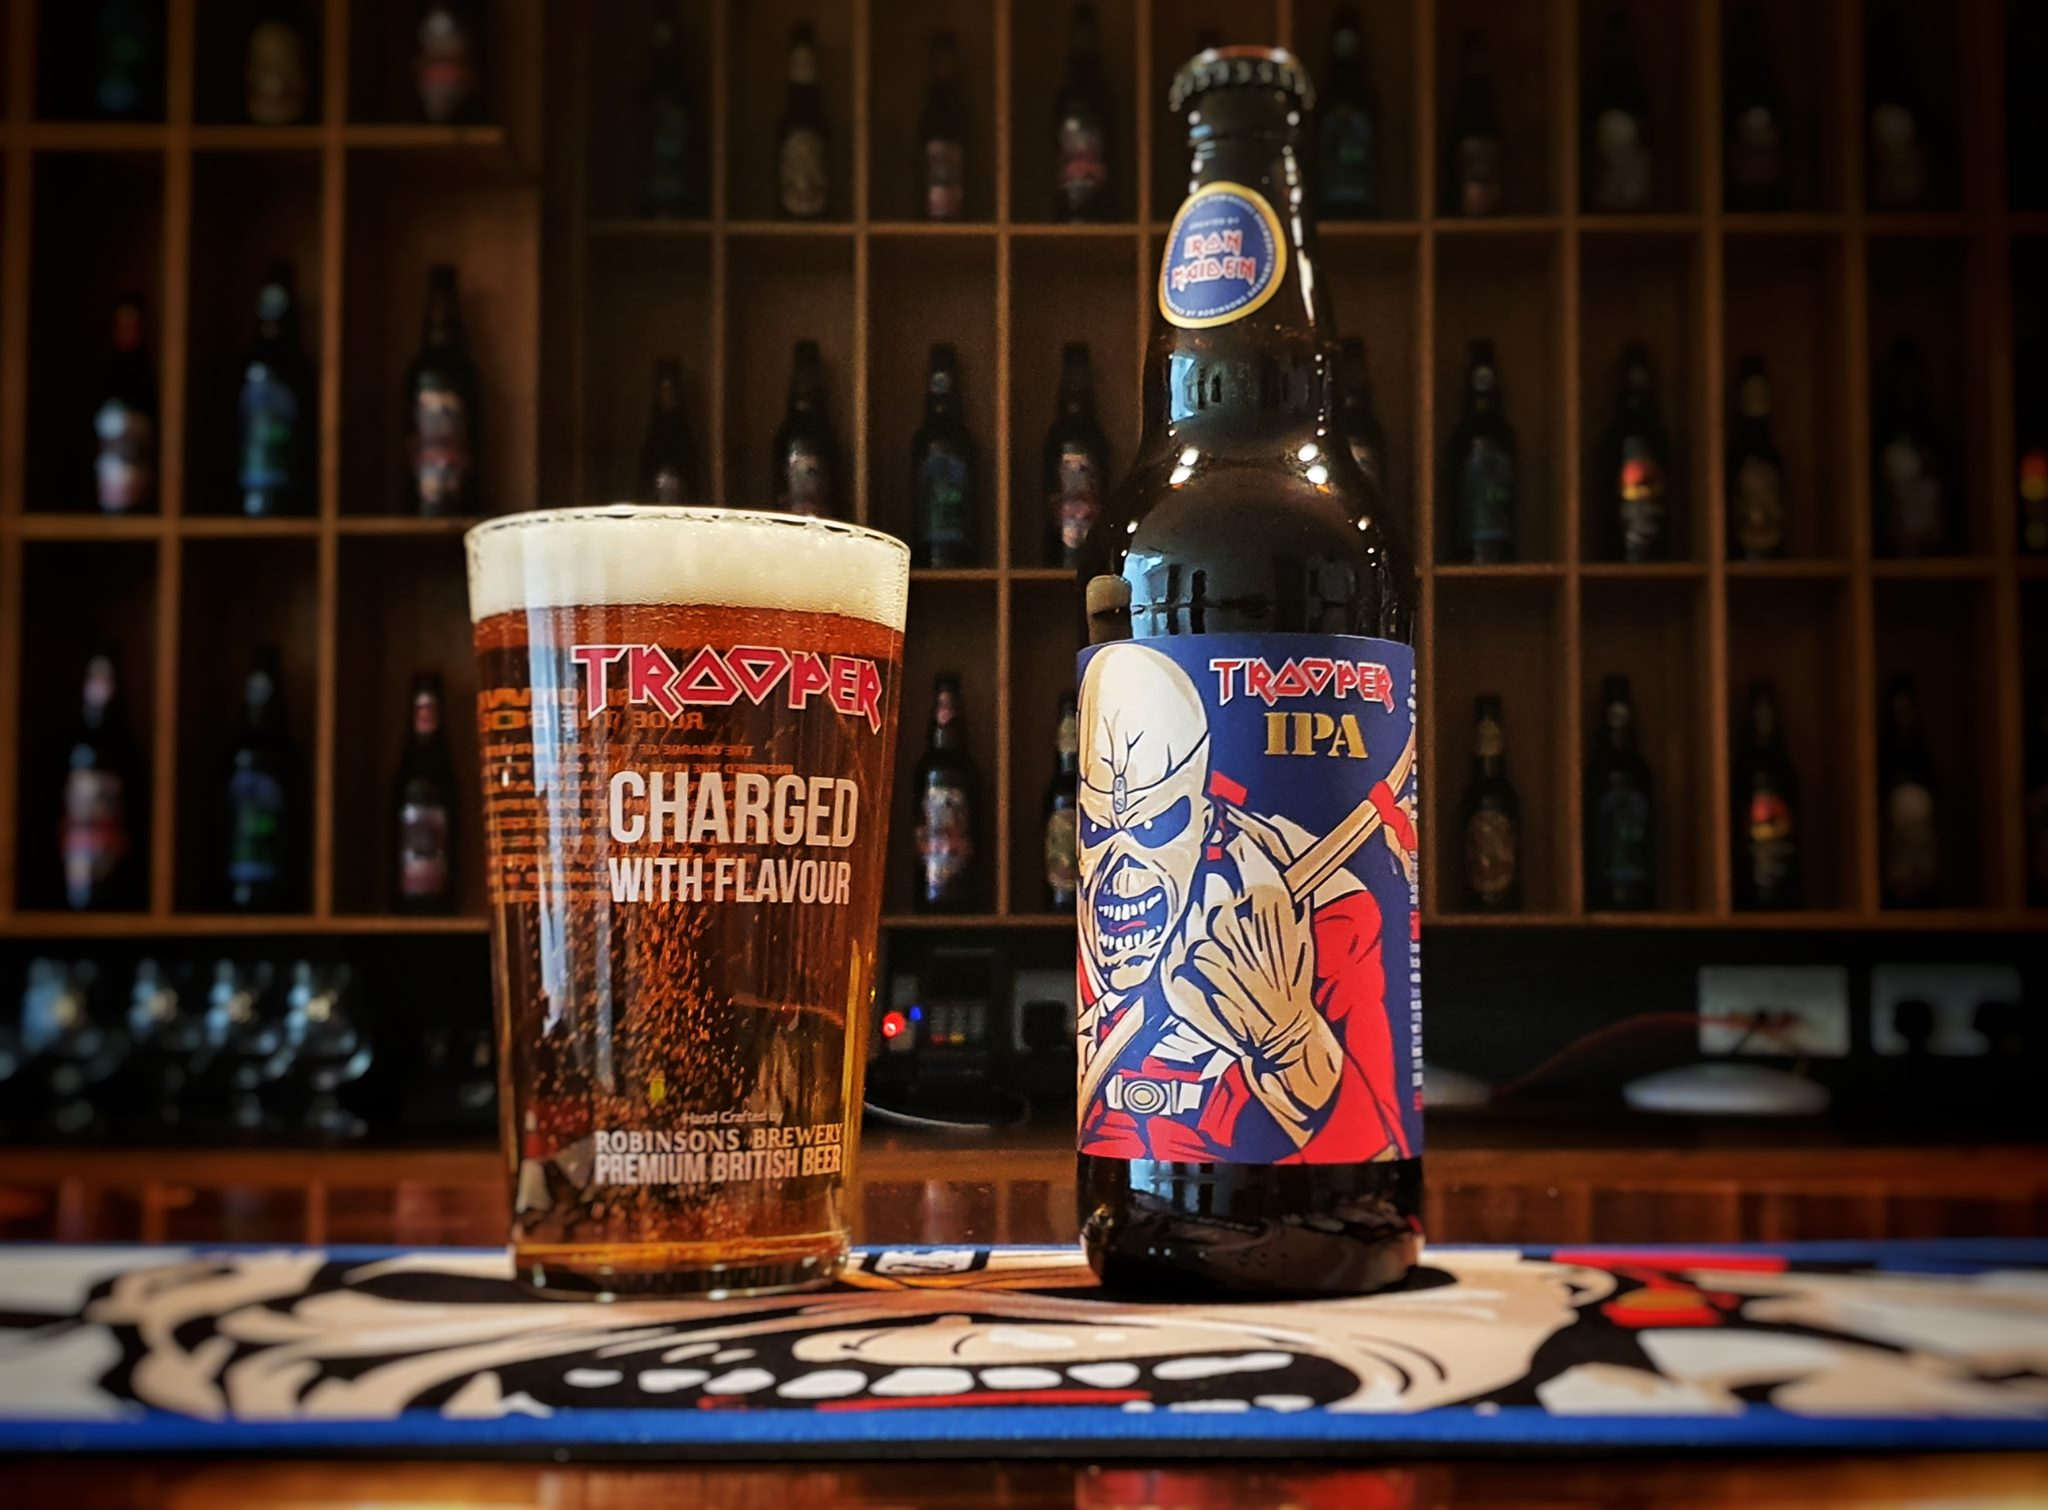 Trooper IPA: nova cerveja do Iron Maiden disponível no Brasil